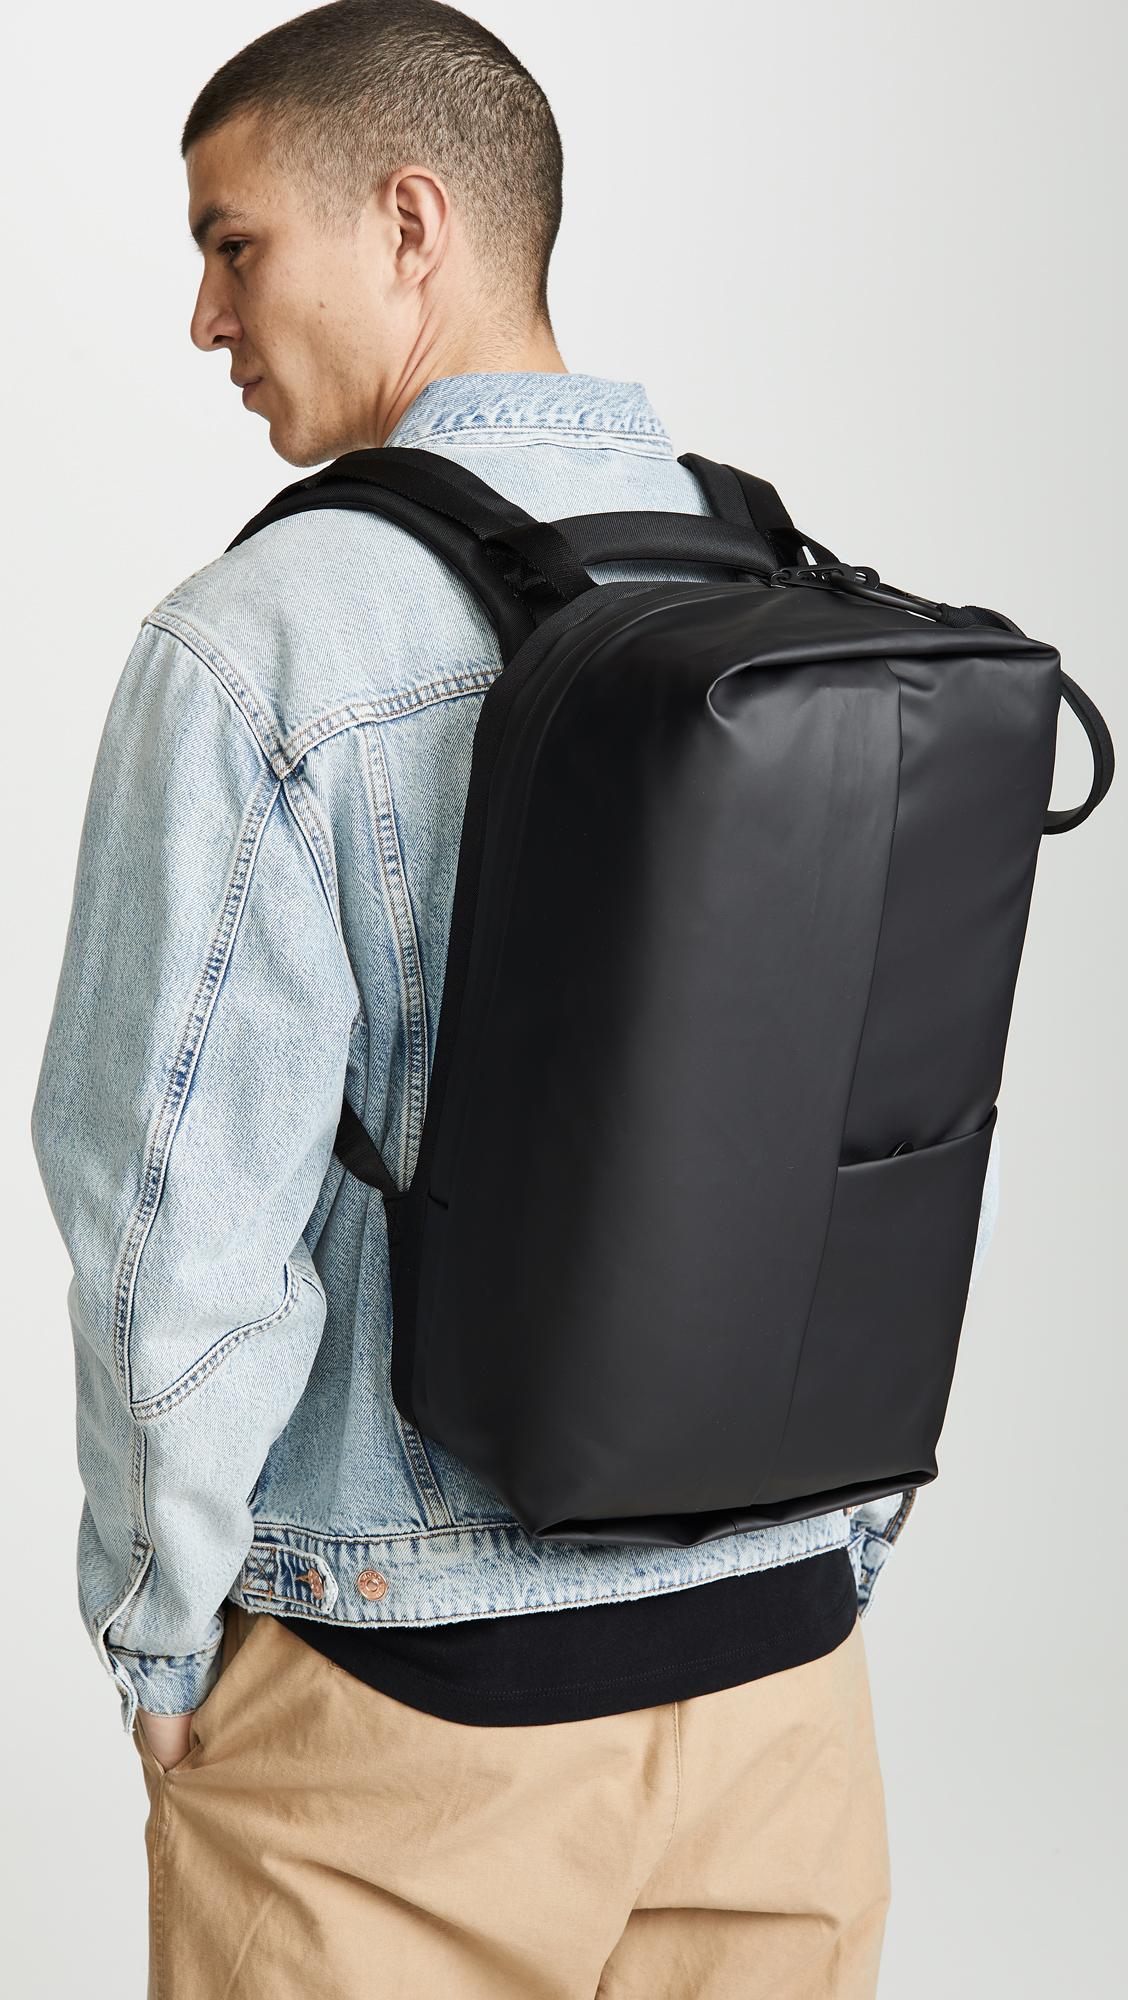 36ba8dc57 Cote & Ciel Sormonne Obsidian Backpack | EAST DANE